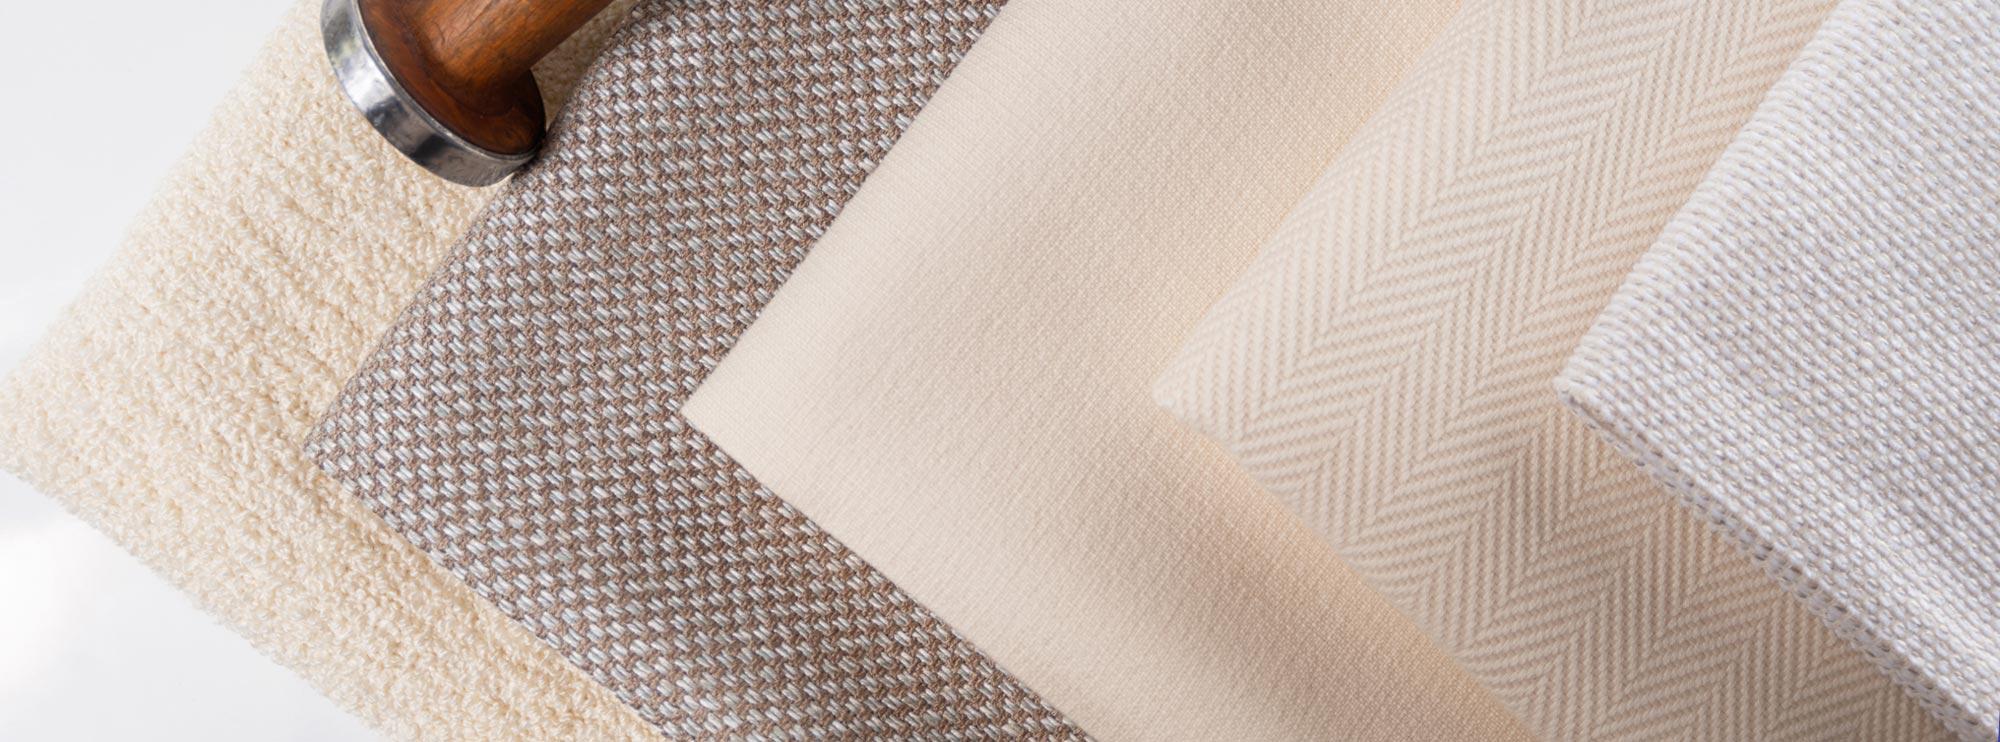 Fabrics from Jamie Stern